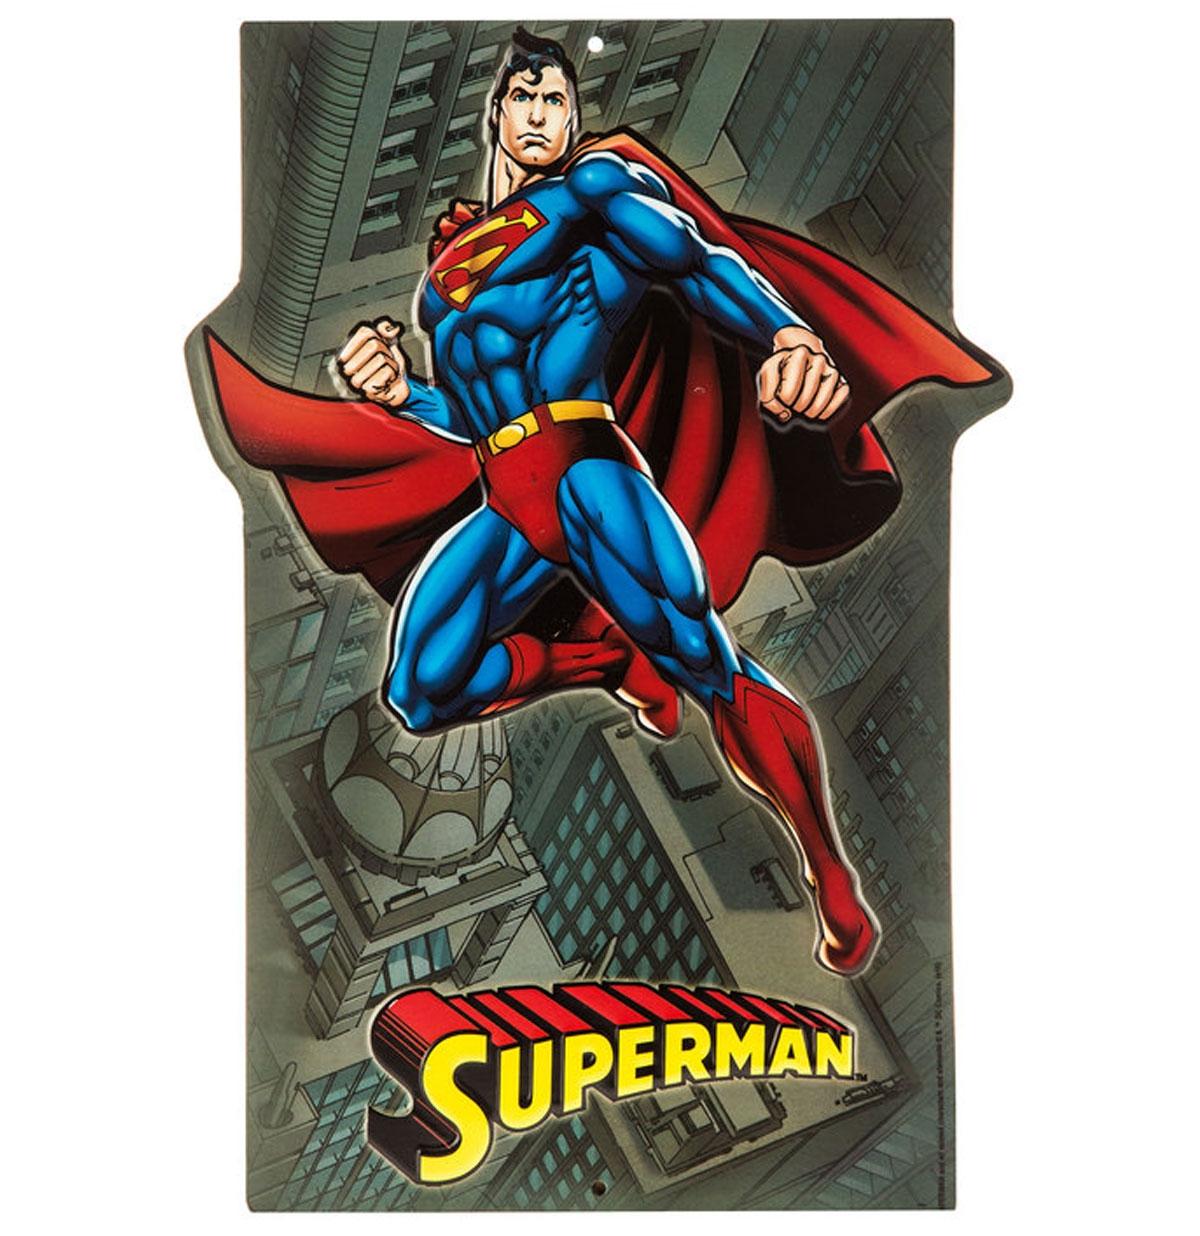 Superman Embossed Metal Sign 32 x 23 cm